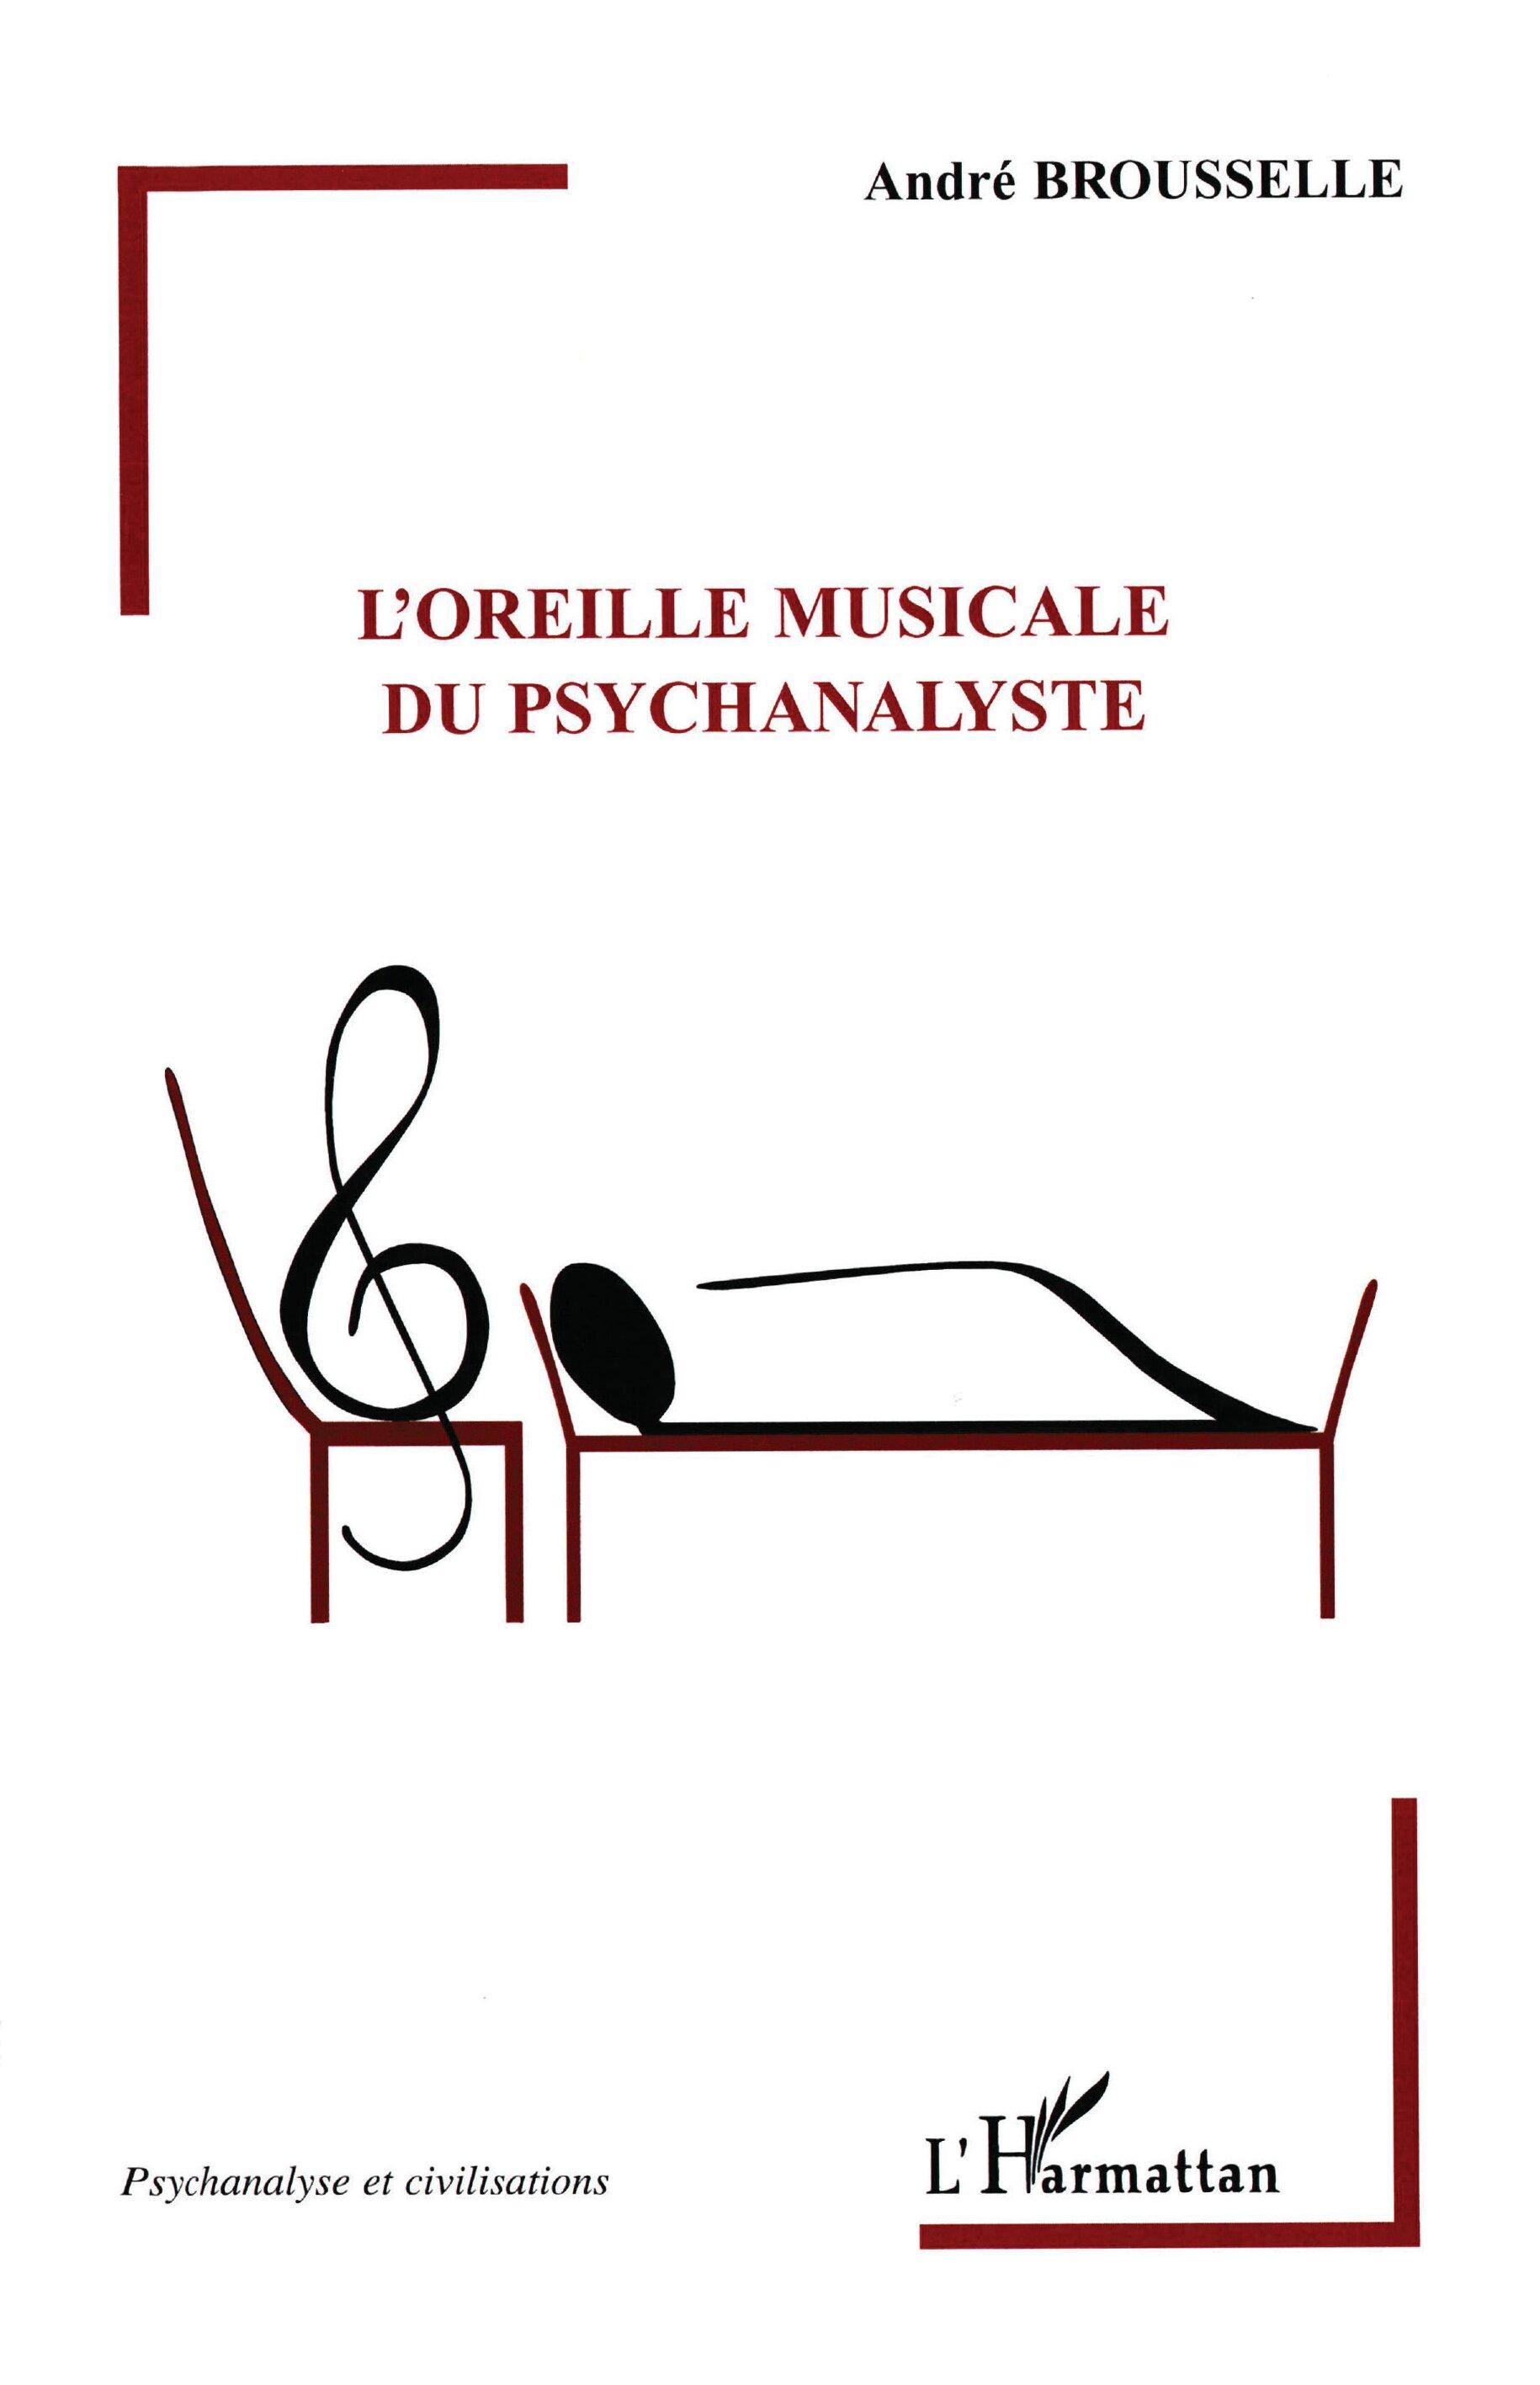 LOREILLE MUSICALE DU PSYCHANALYSTE Andre Brousselle